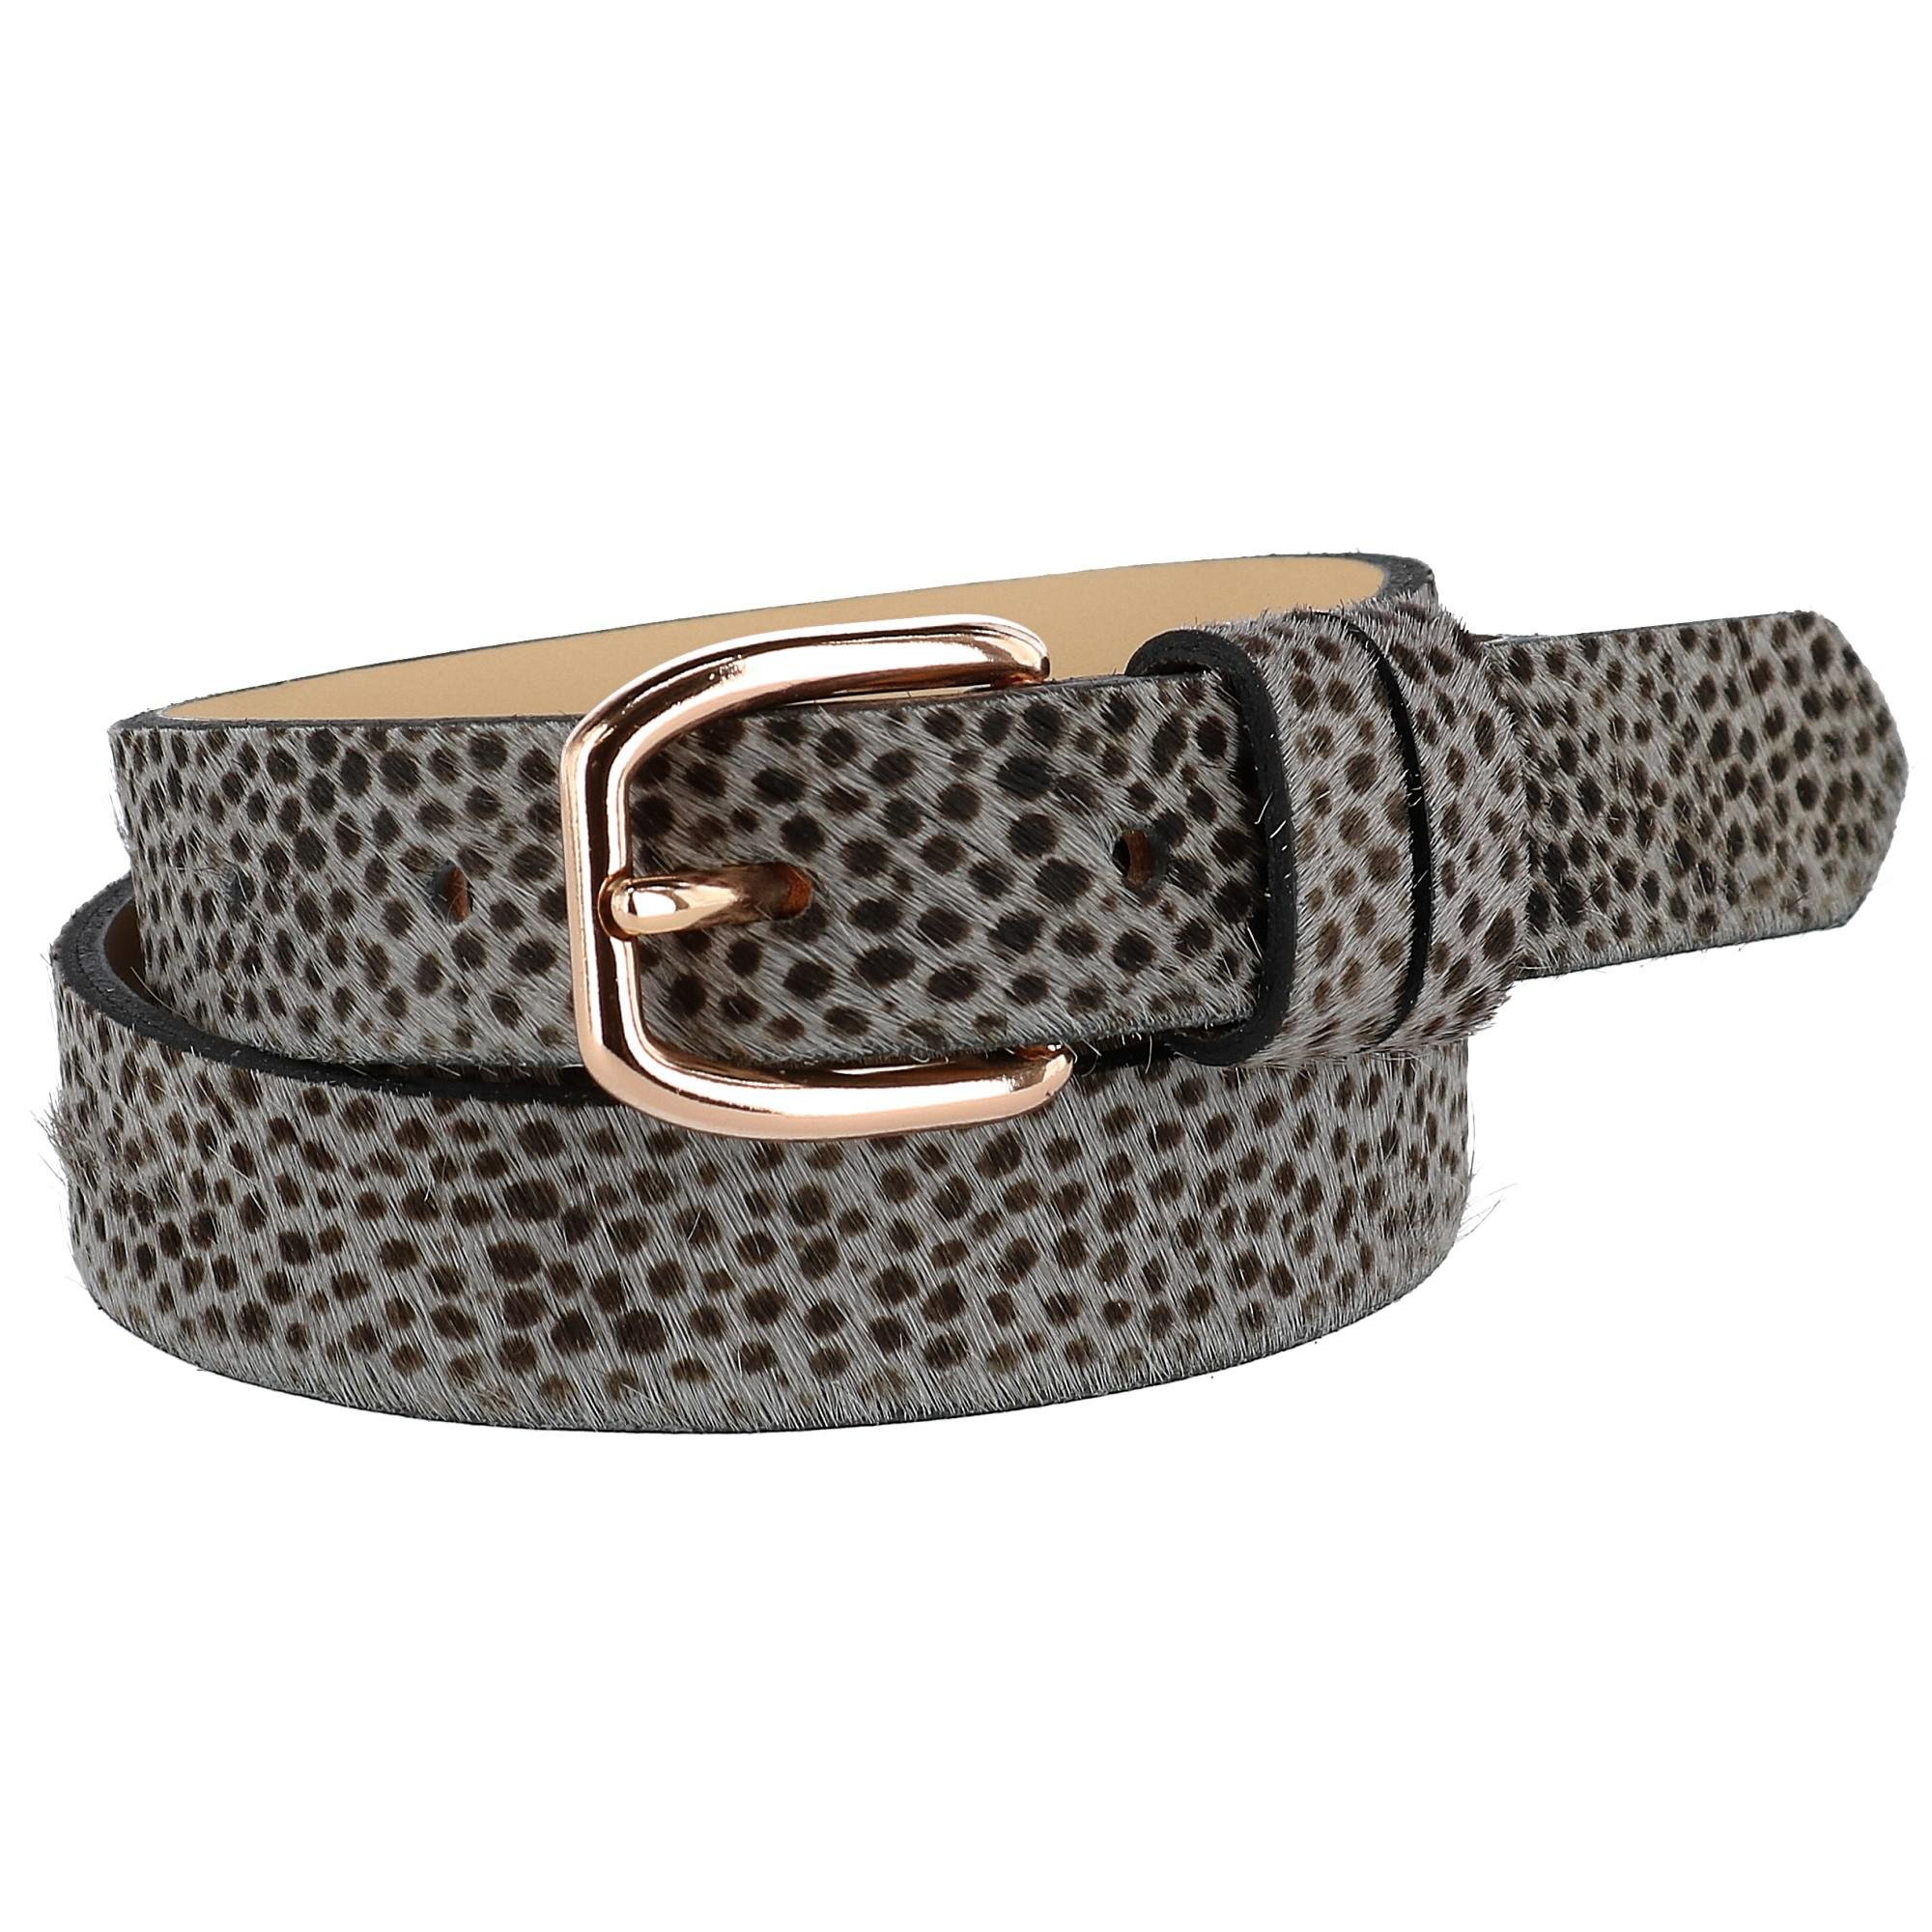 The British Belt Company Women's Tamsin Leopard Print Pony Hair Belt, Medium by The British Belt Co.